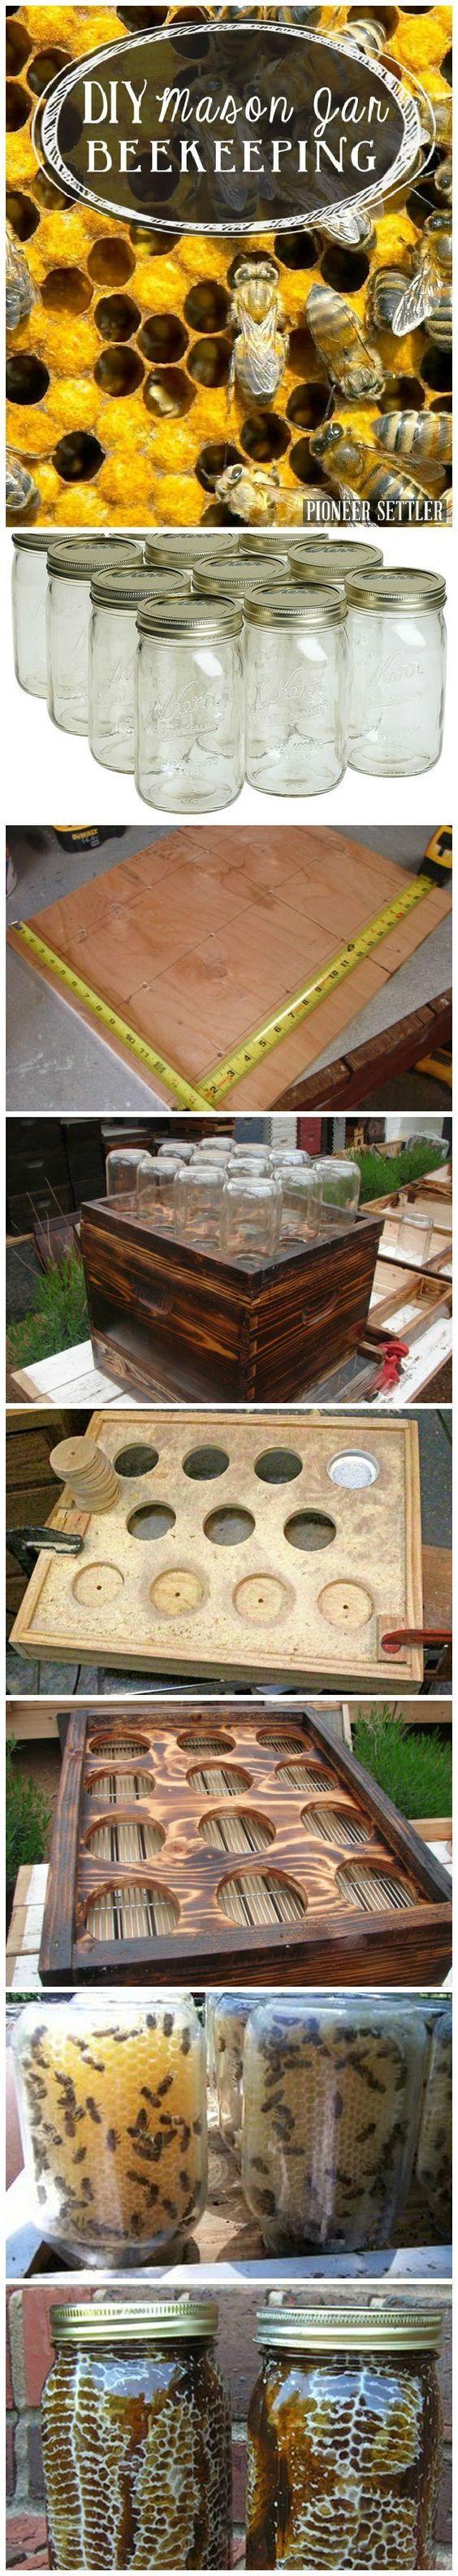 DIY Mason Jar Beekeeping | Bees and Beekeeping Tips and Recipes | Pioneer Settler | DIY Hive Building and Beekeeping 101 at pioneersettler.com: